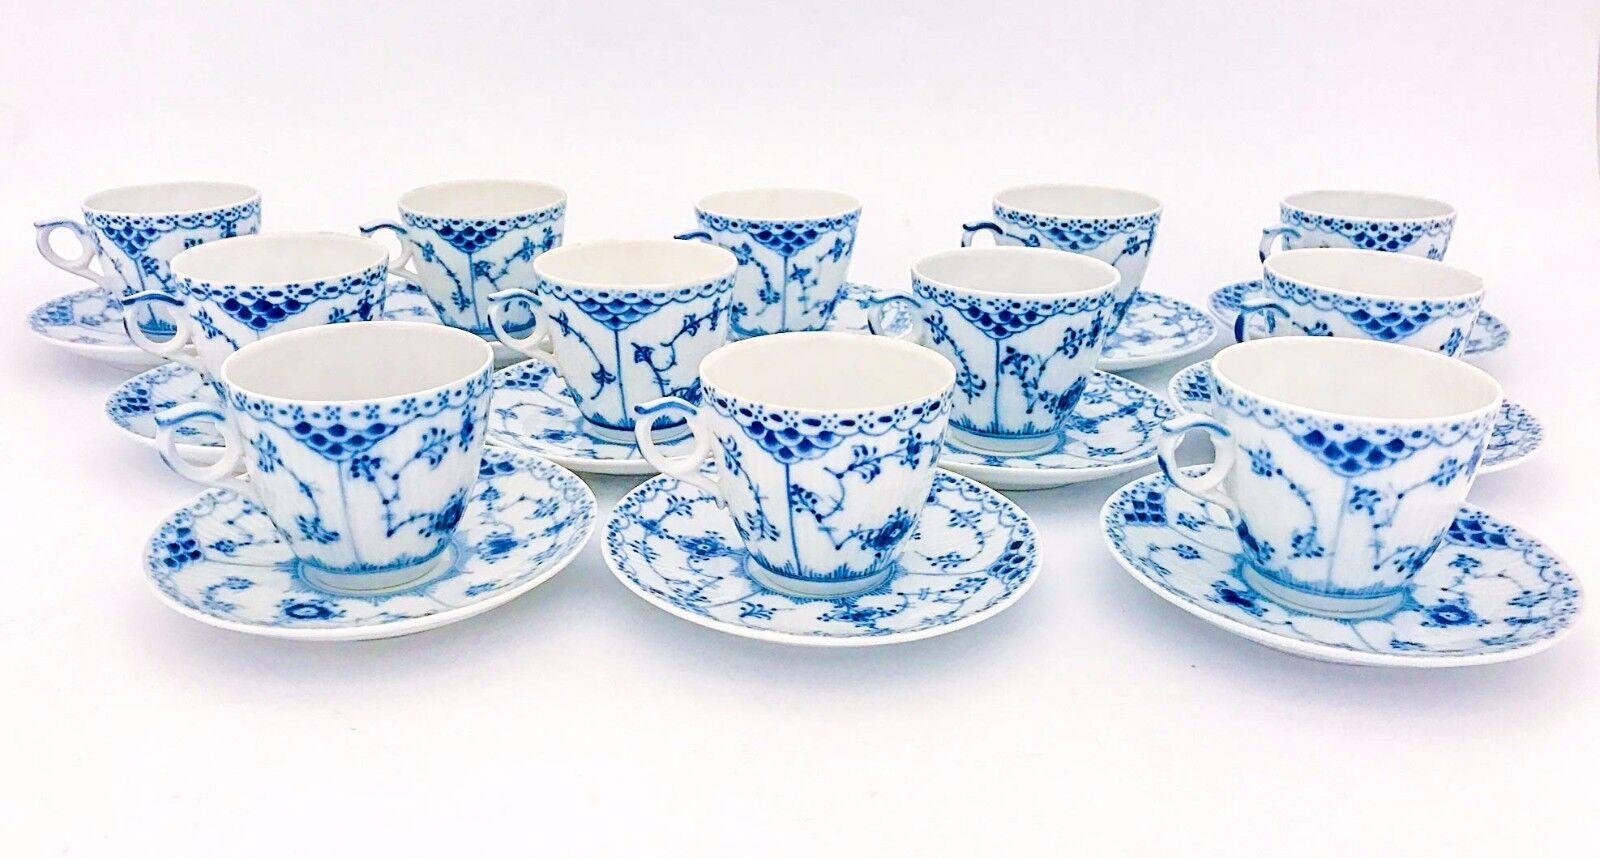 Image 3 - 12 Cups & Saucers #719 - Blue Fluted Royal Copenhagen - Half Lace - 1st Quality